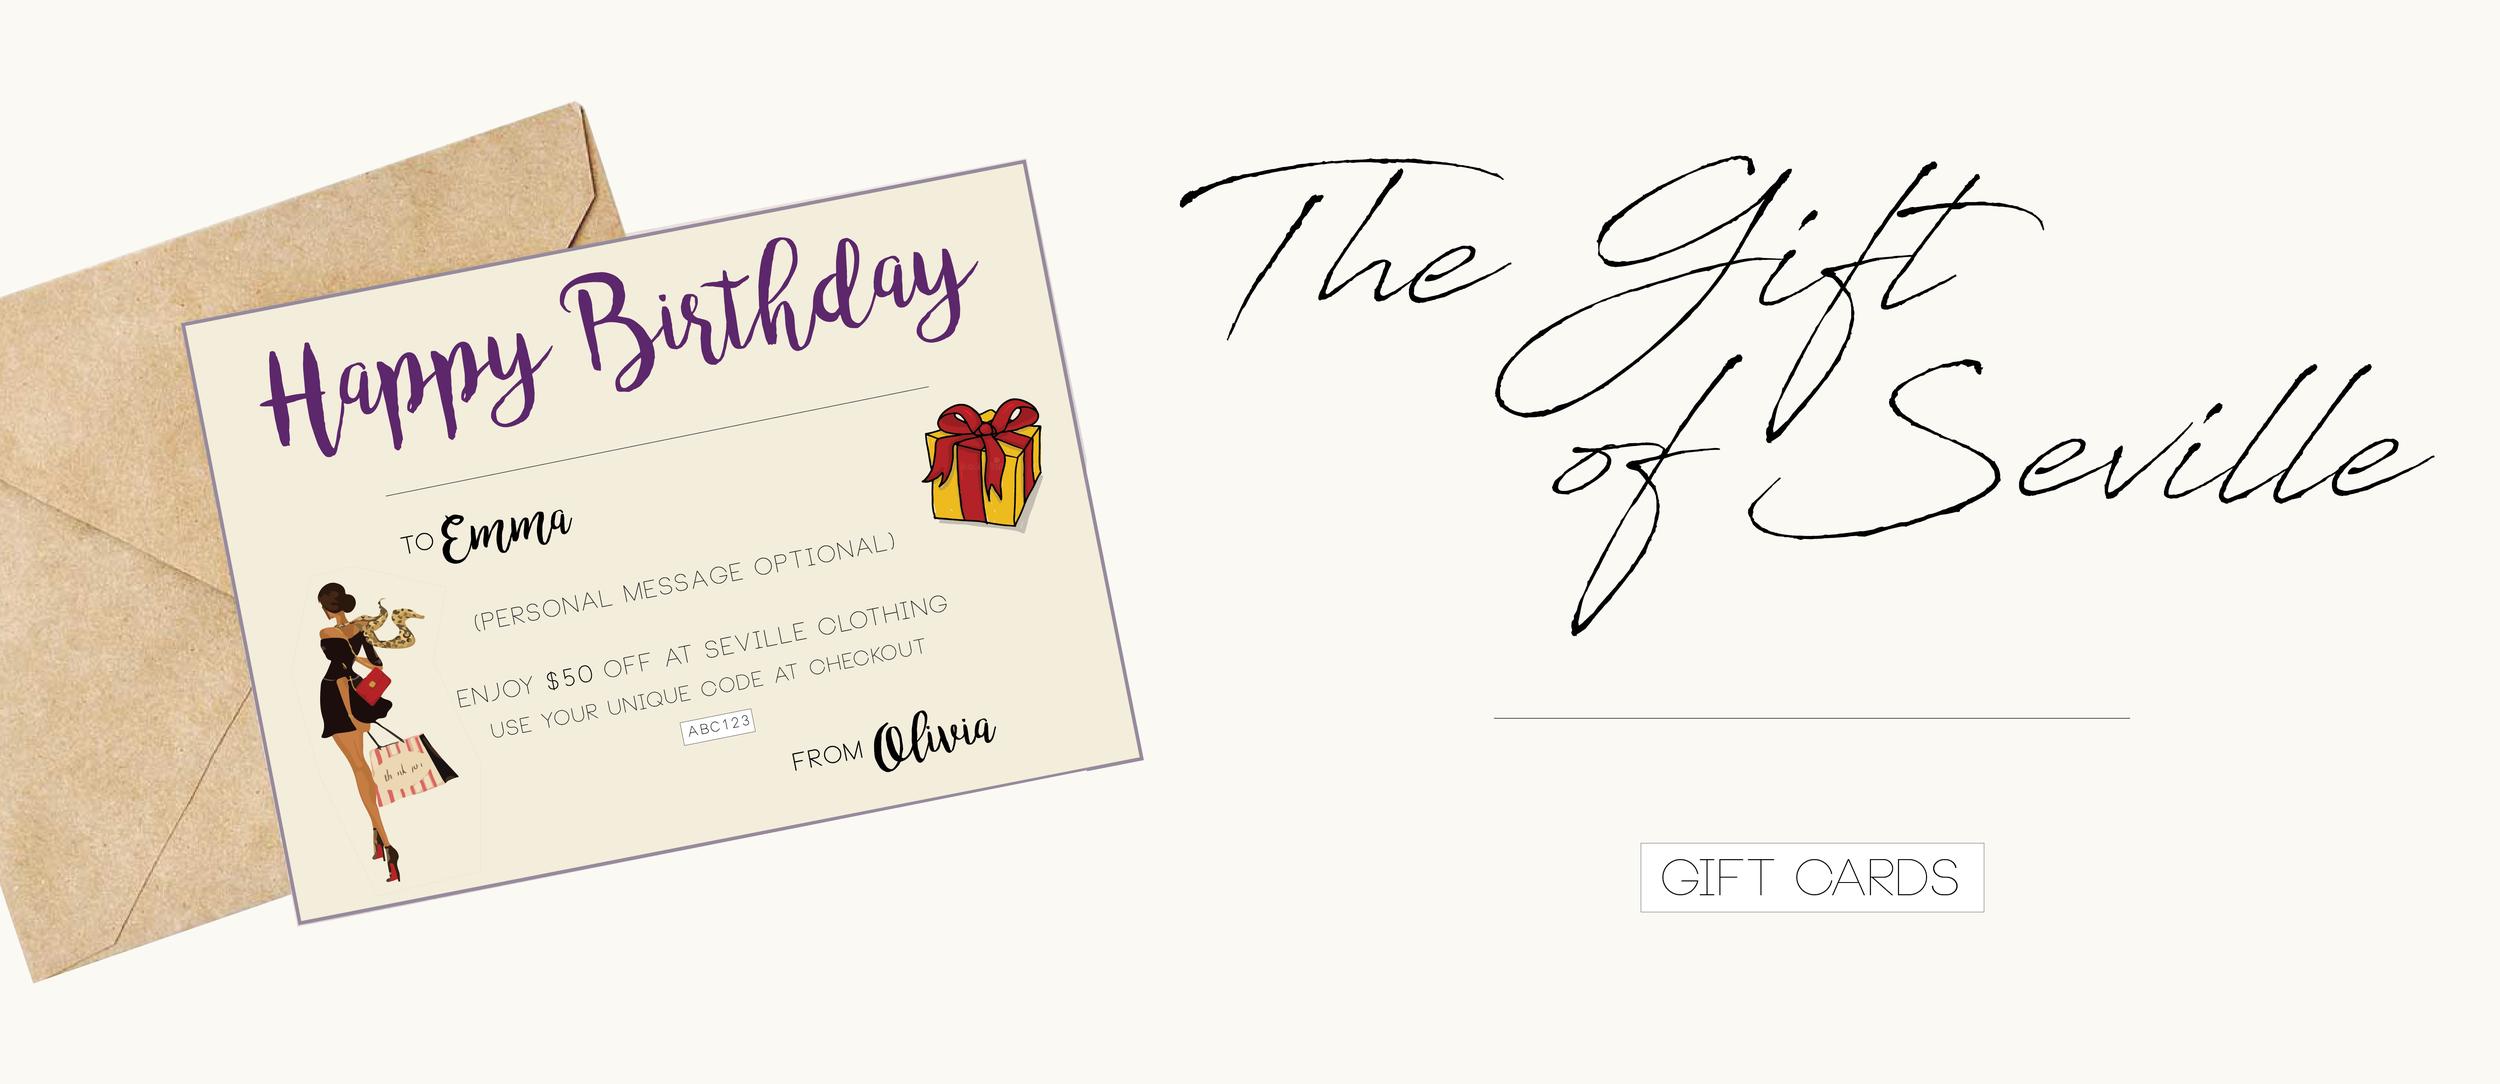 giftcard-header-01.png